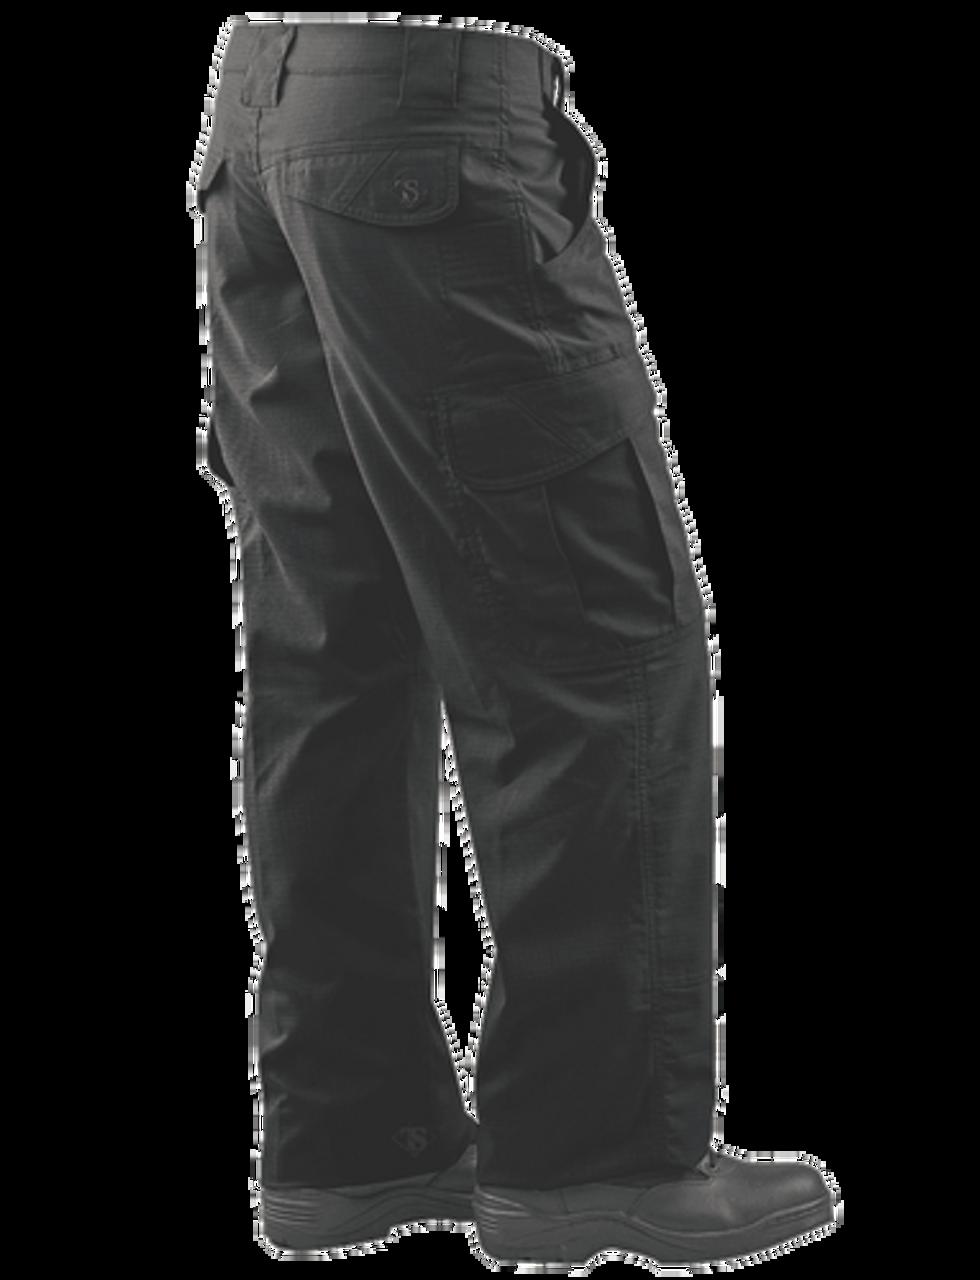 NEW TRU-SPEC WOMENS 24-7 CLASSIC TACTICAL PANTS 1193 KHAKI SIZE 22x32